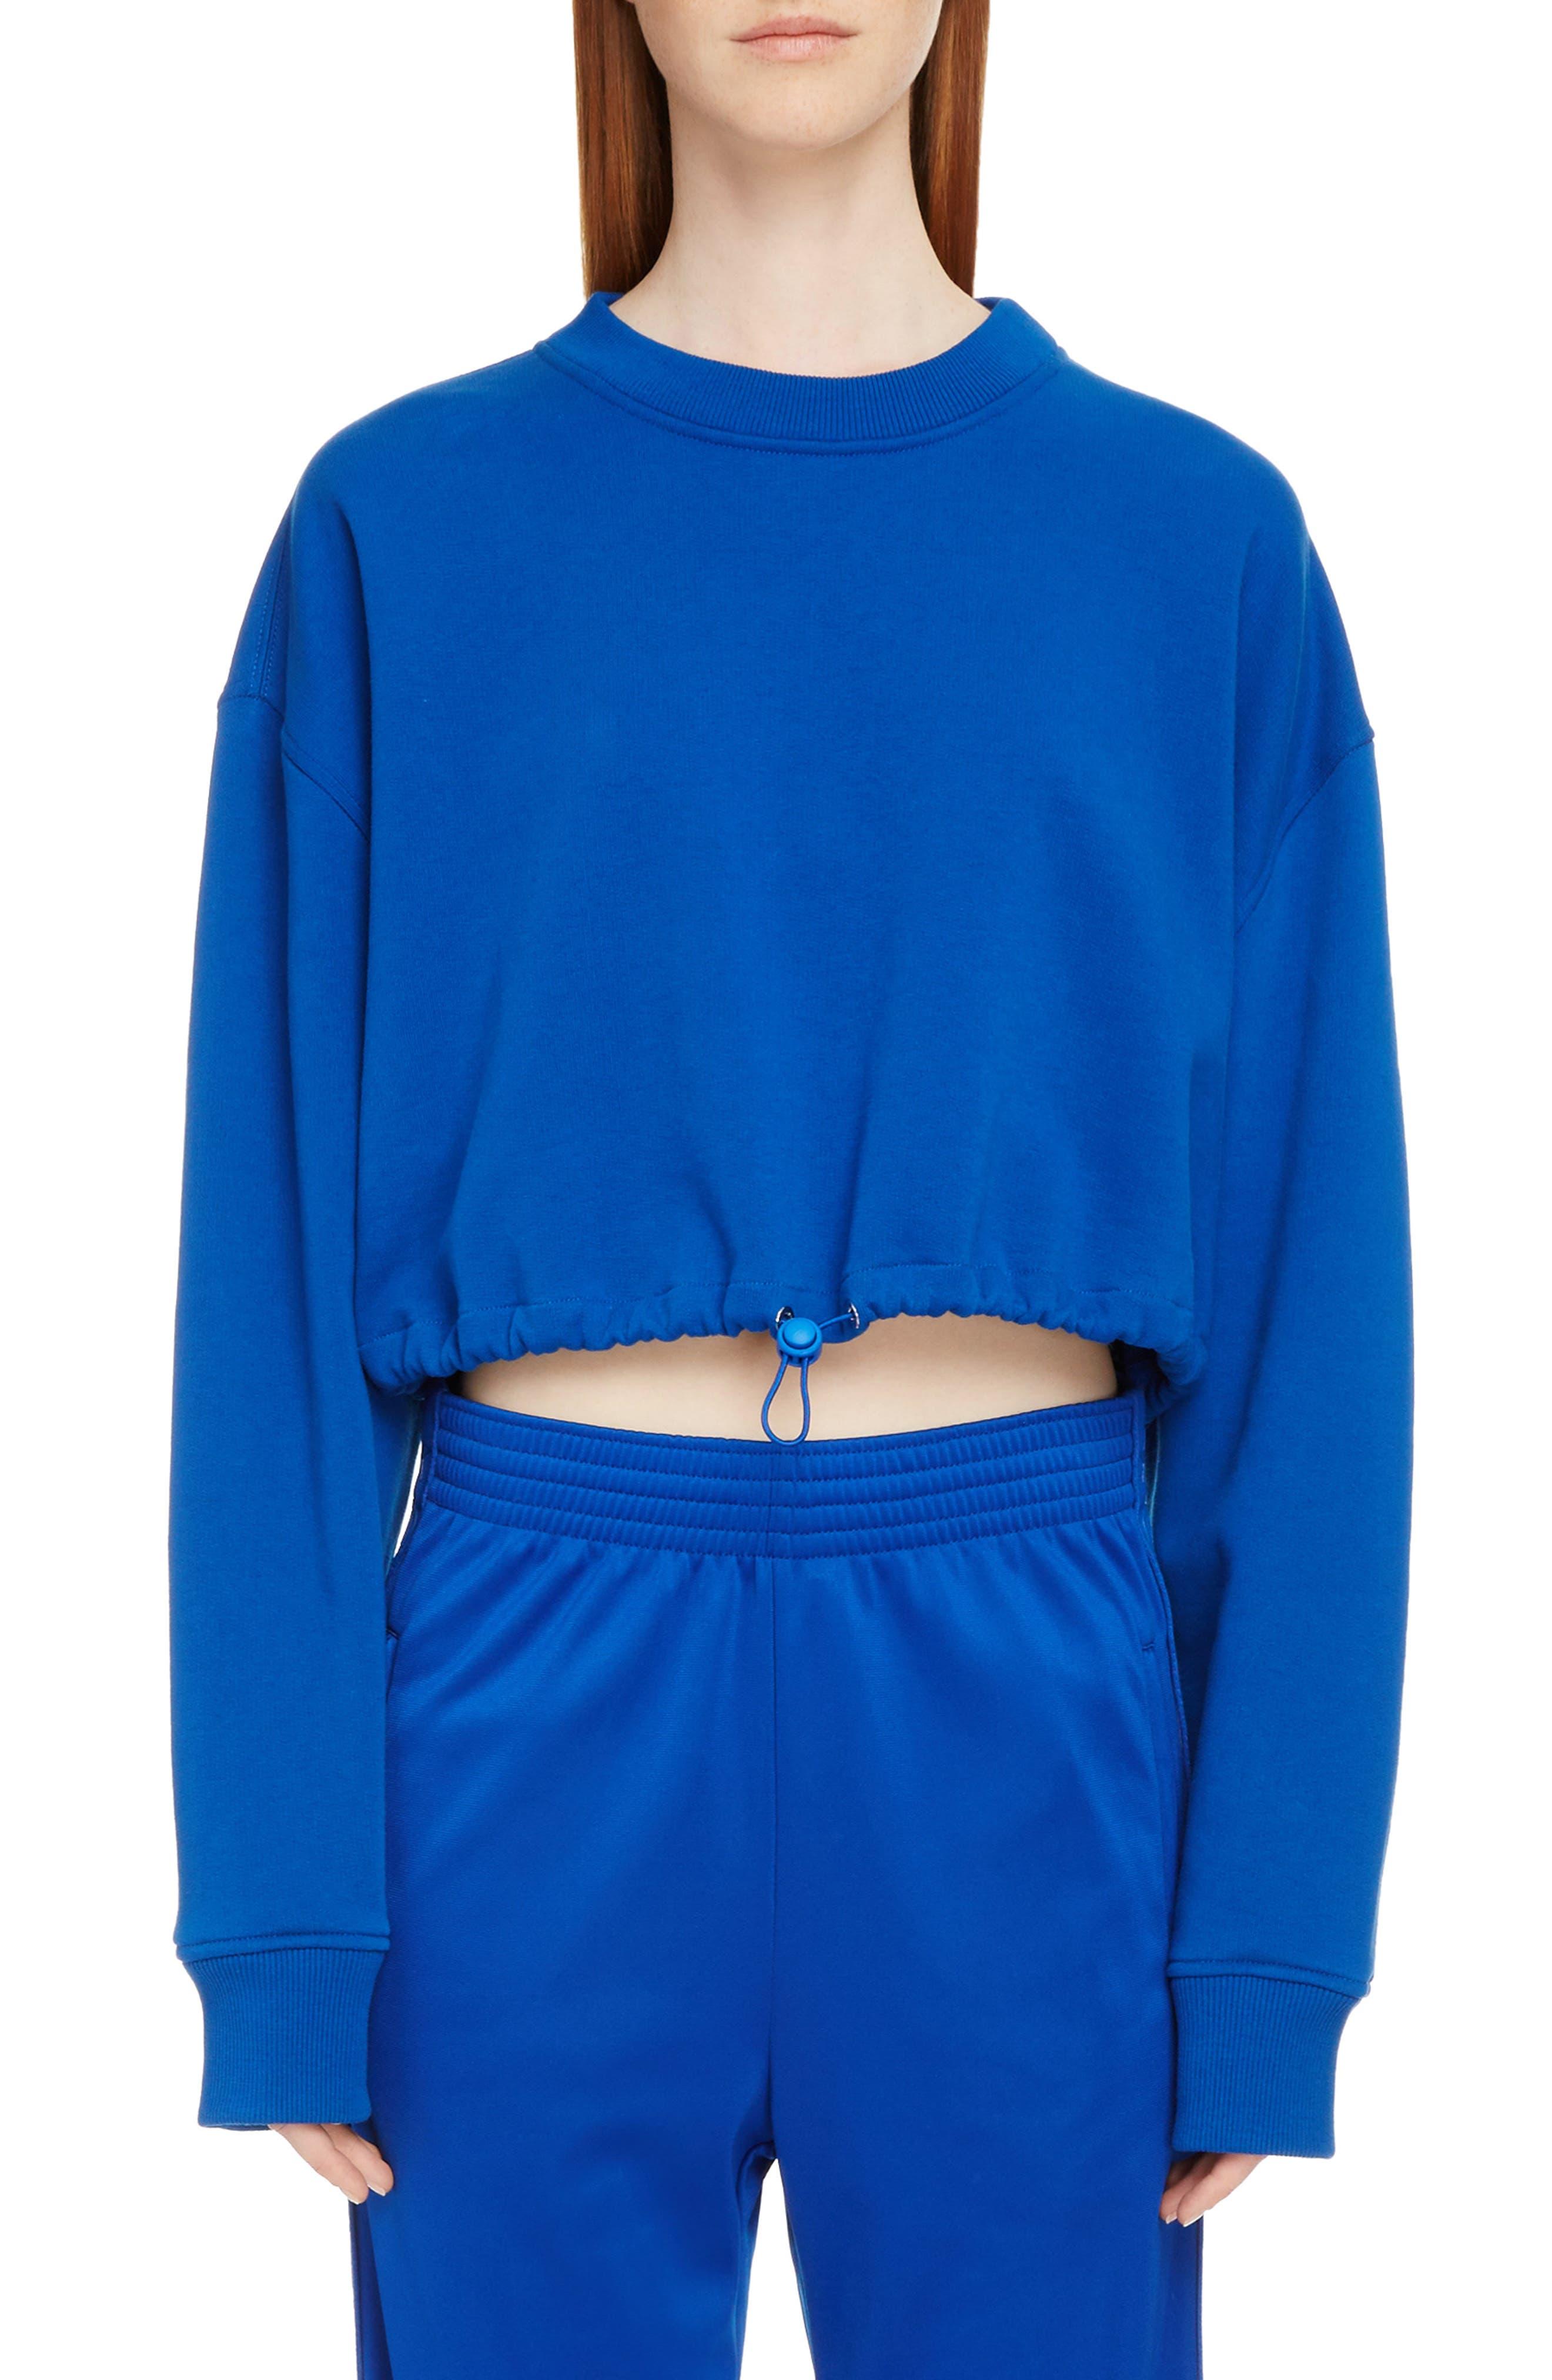 Main Image - Givenchy Crop Sweatshirt